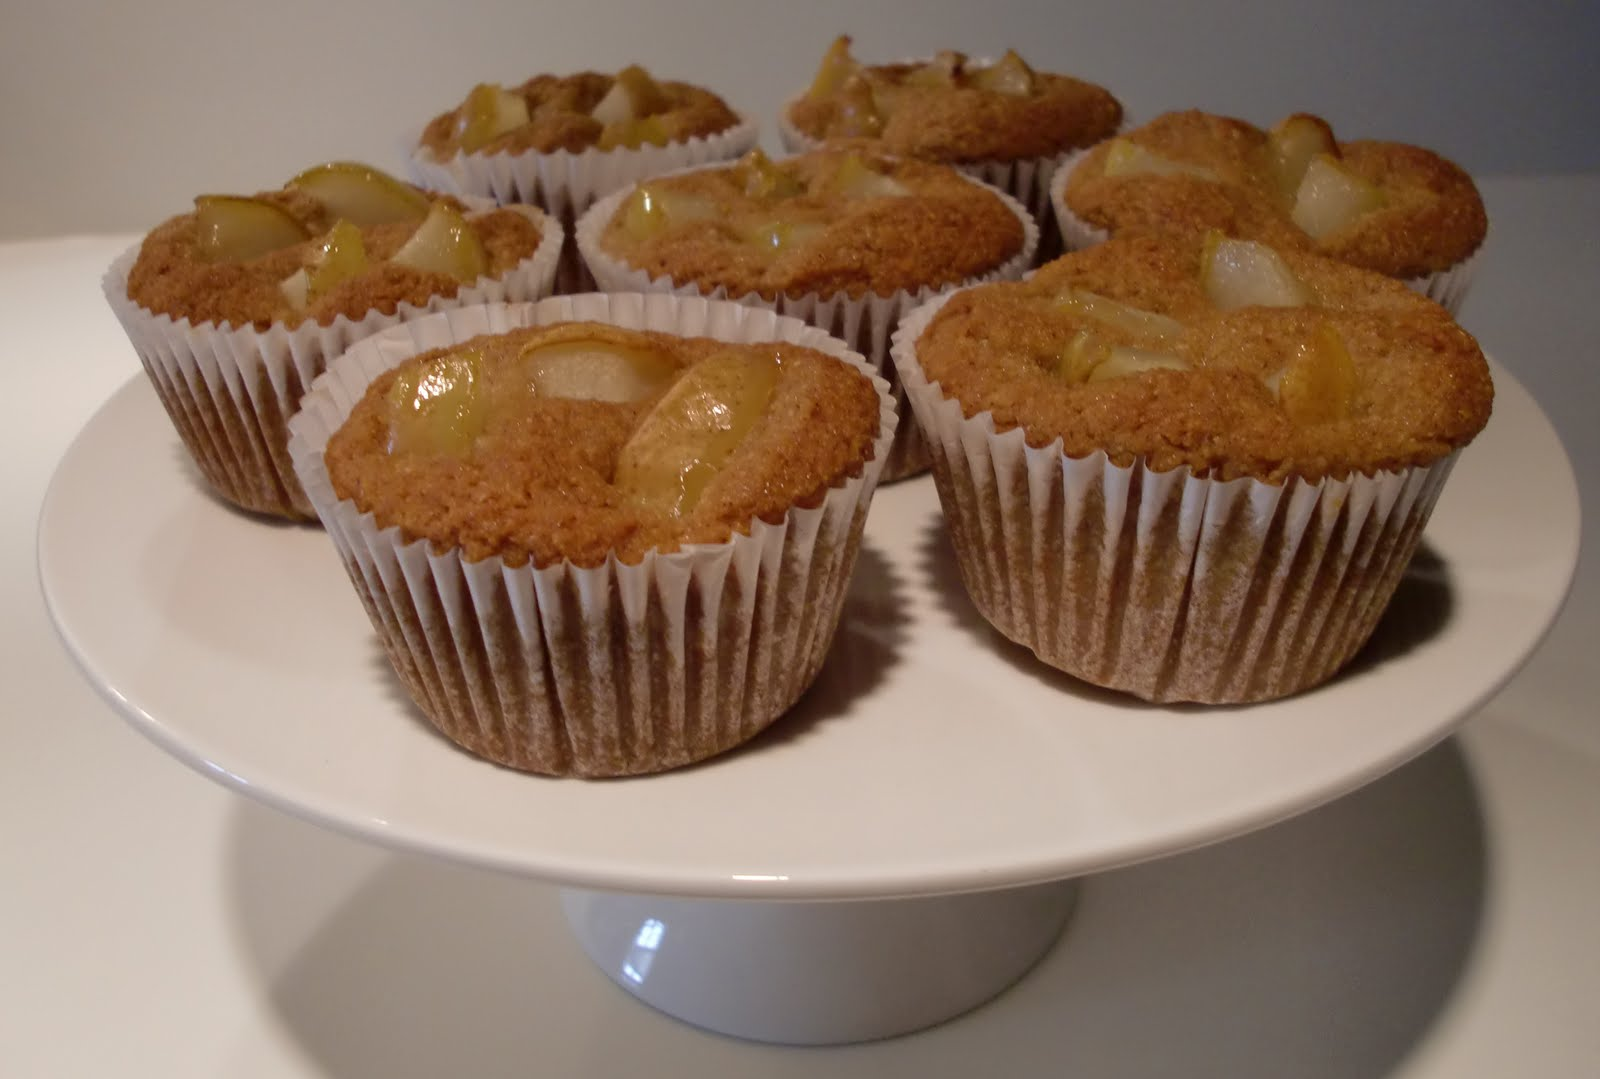 gluten-free treats: Pear Cornmeal Muffins